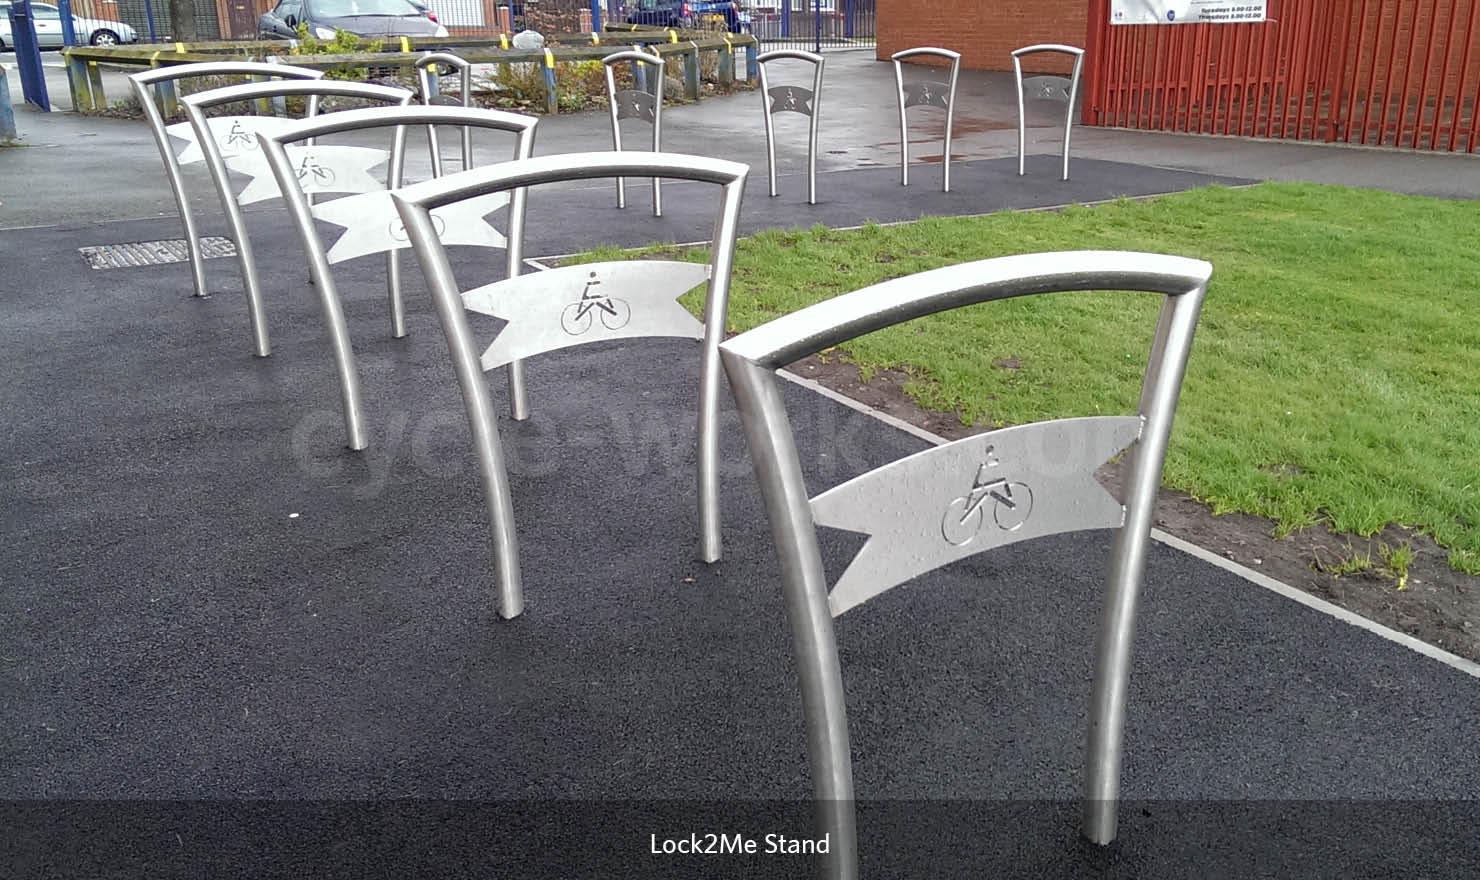 Secure Bike Stands